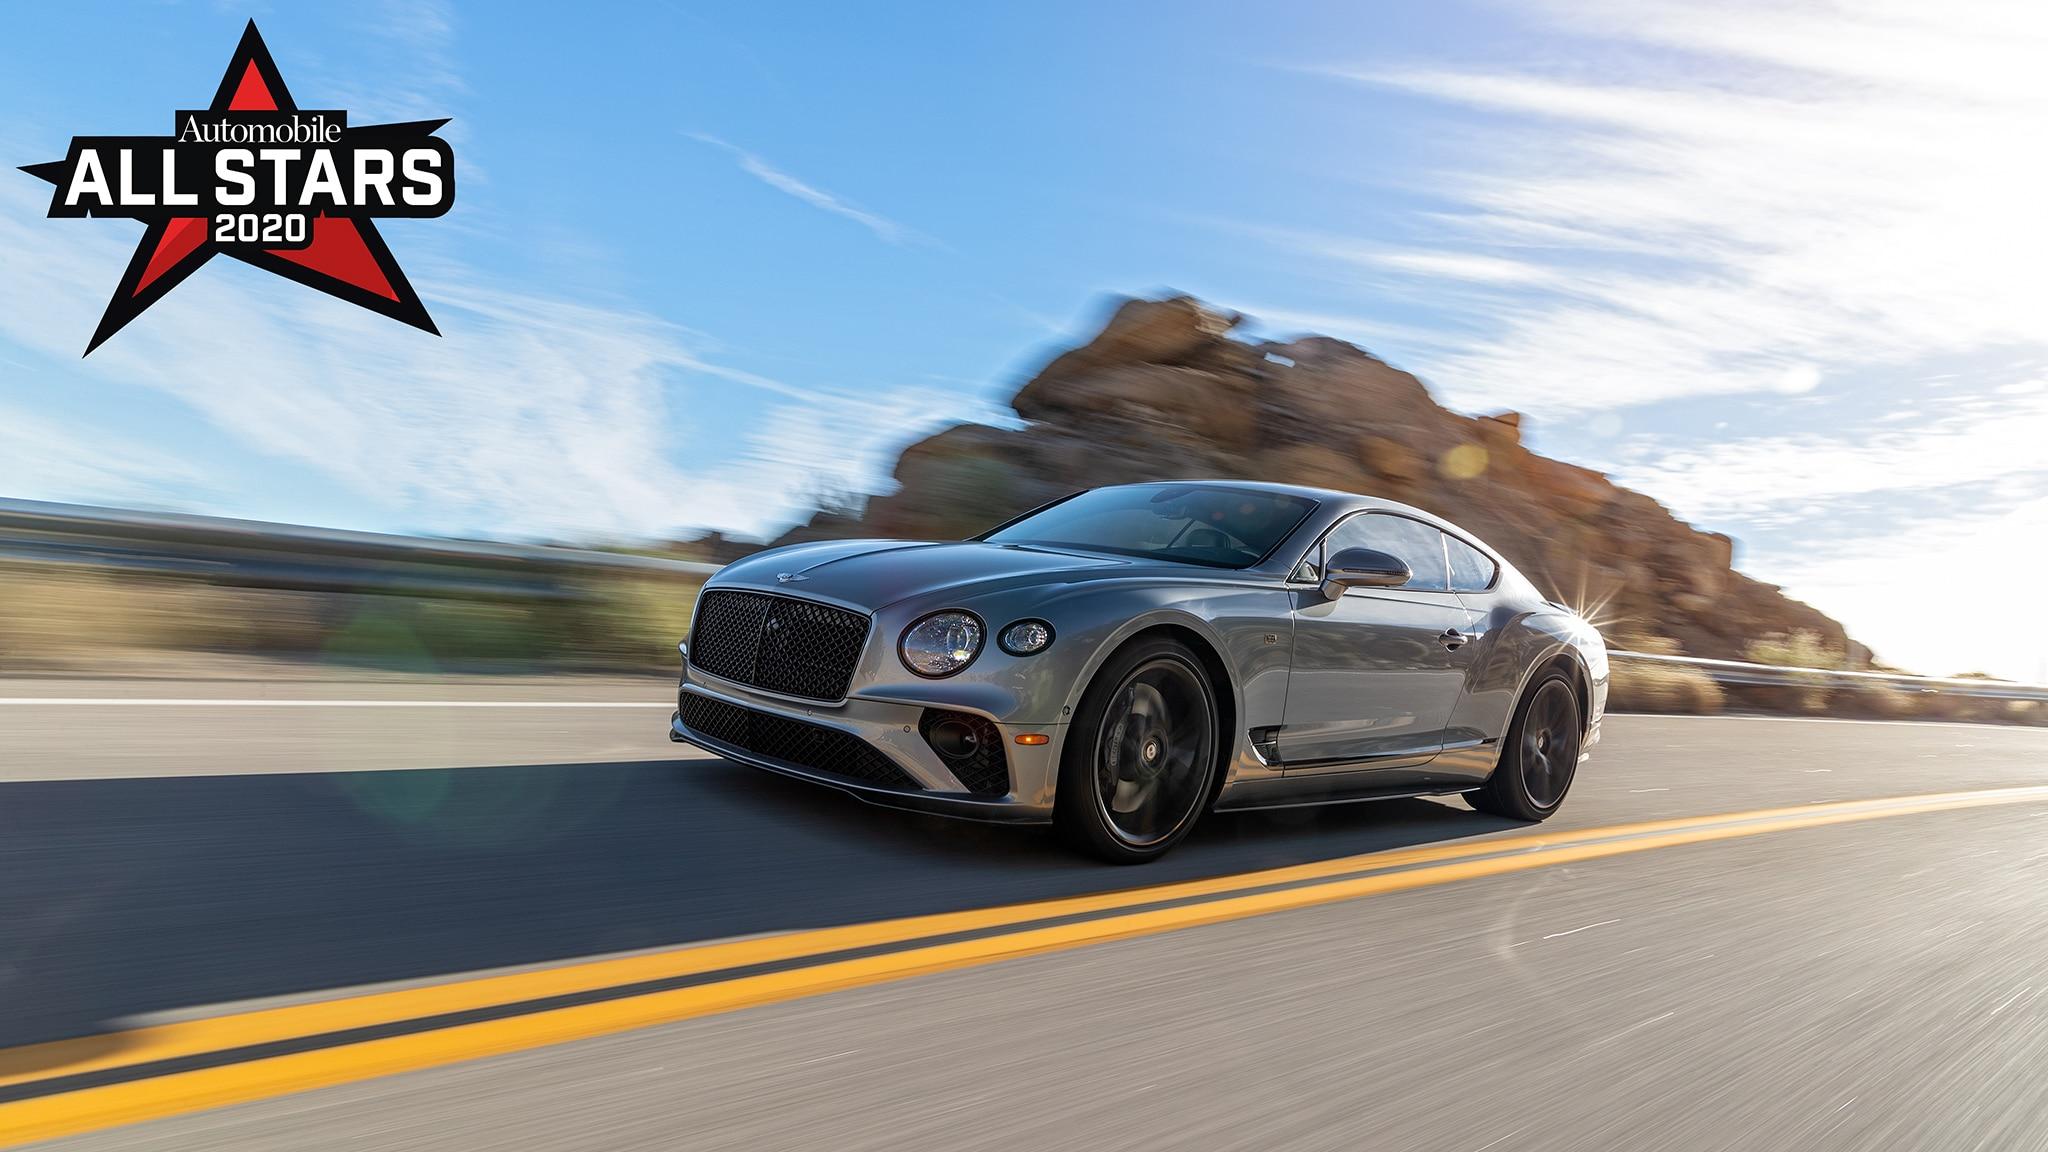 2020 Bentley Continental Gt Test Drive Automobile All Stars Winner